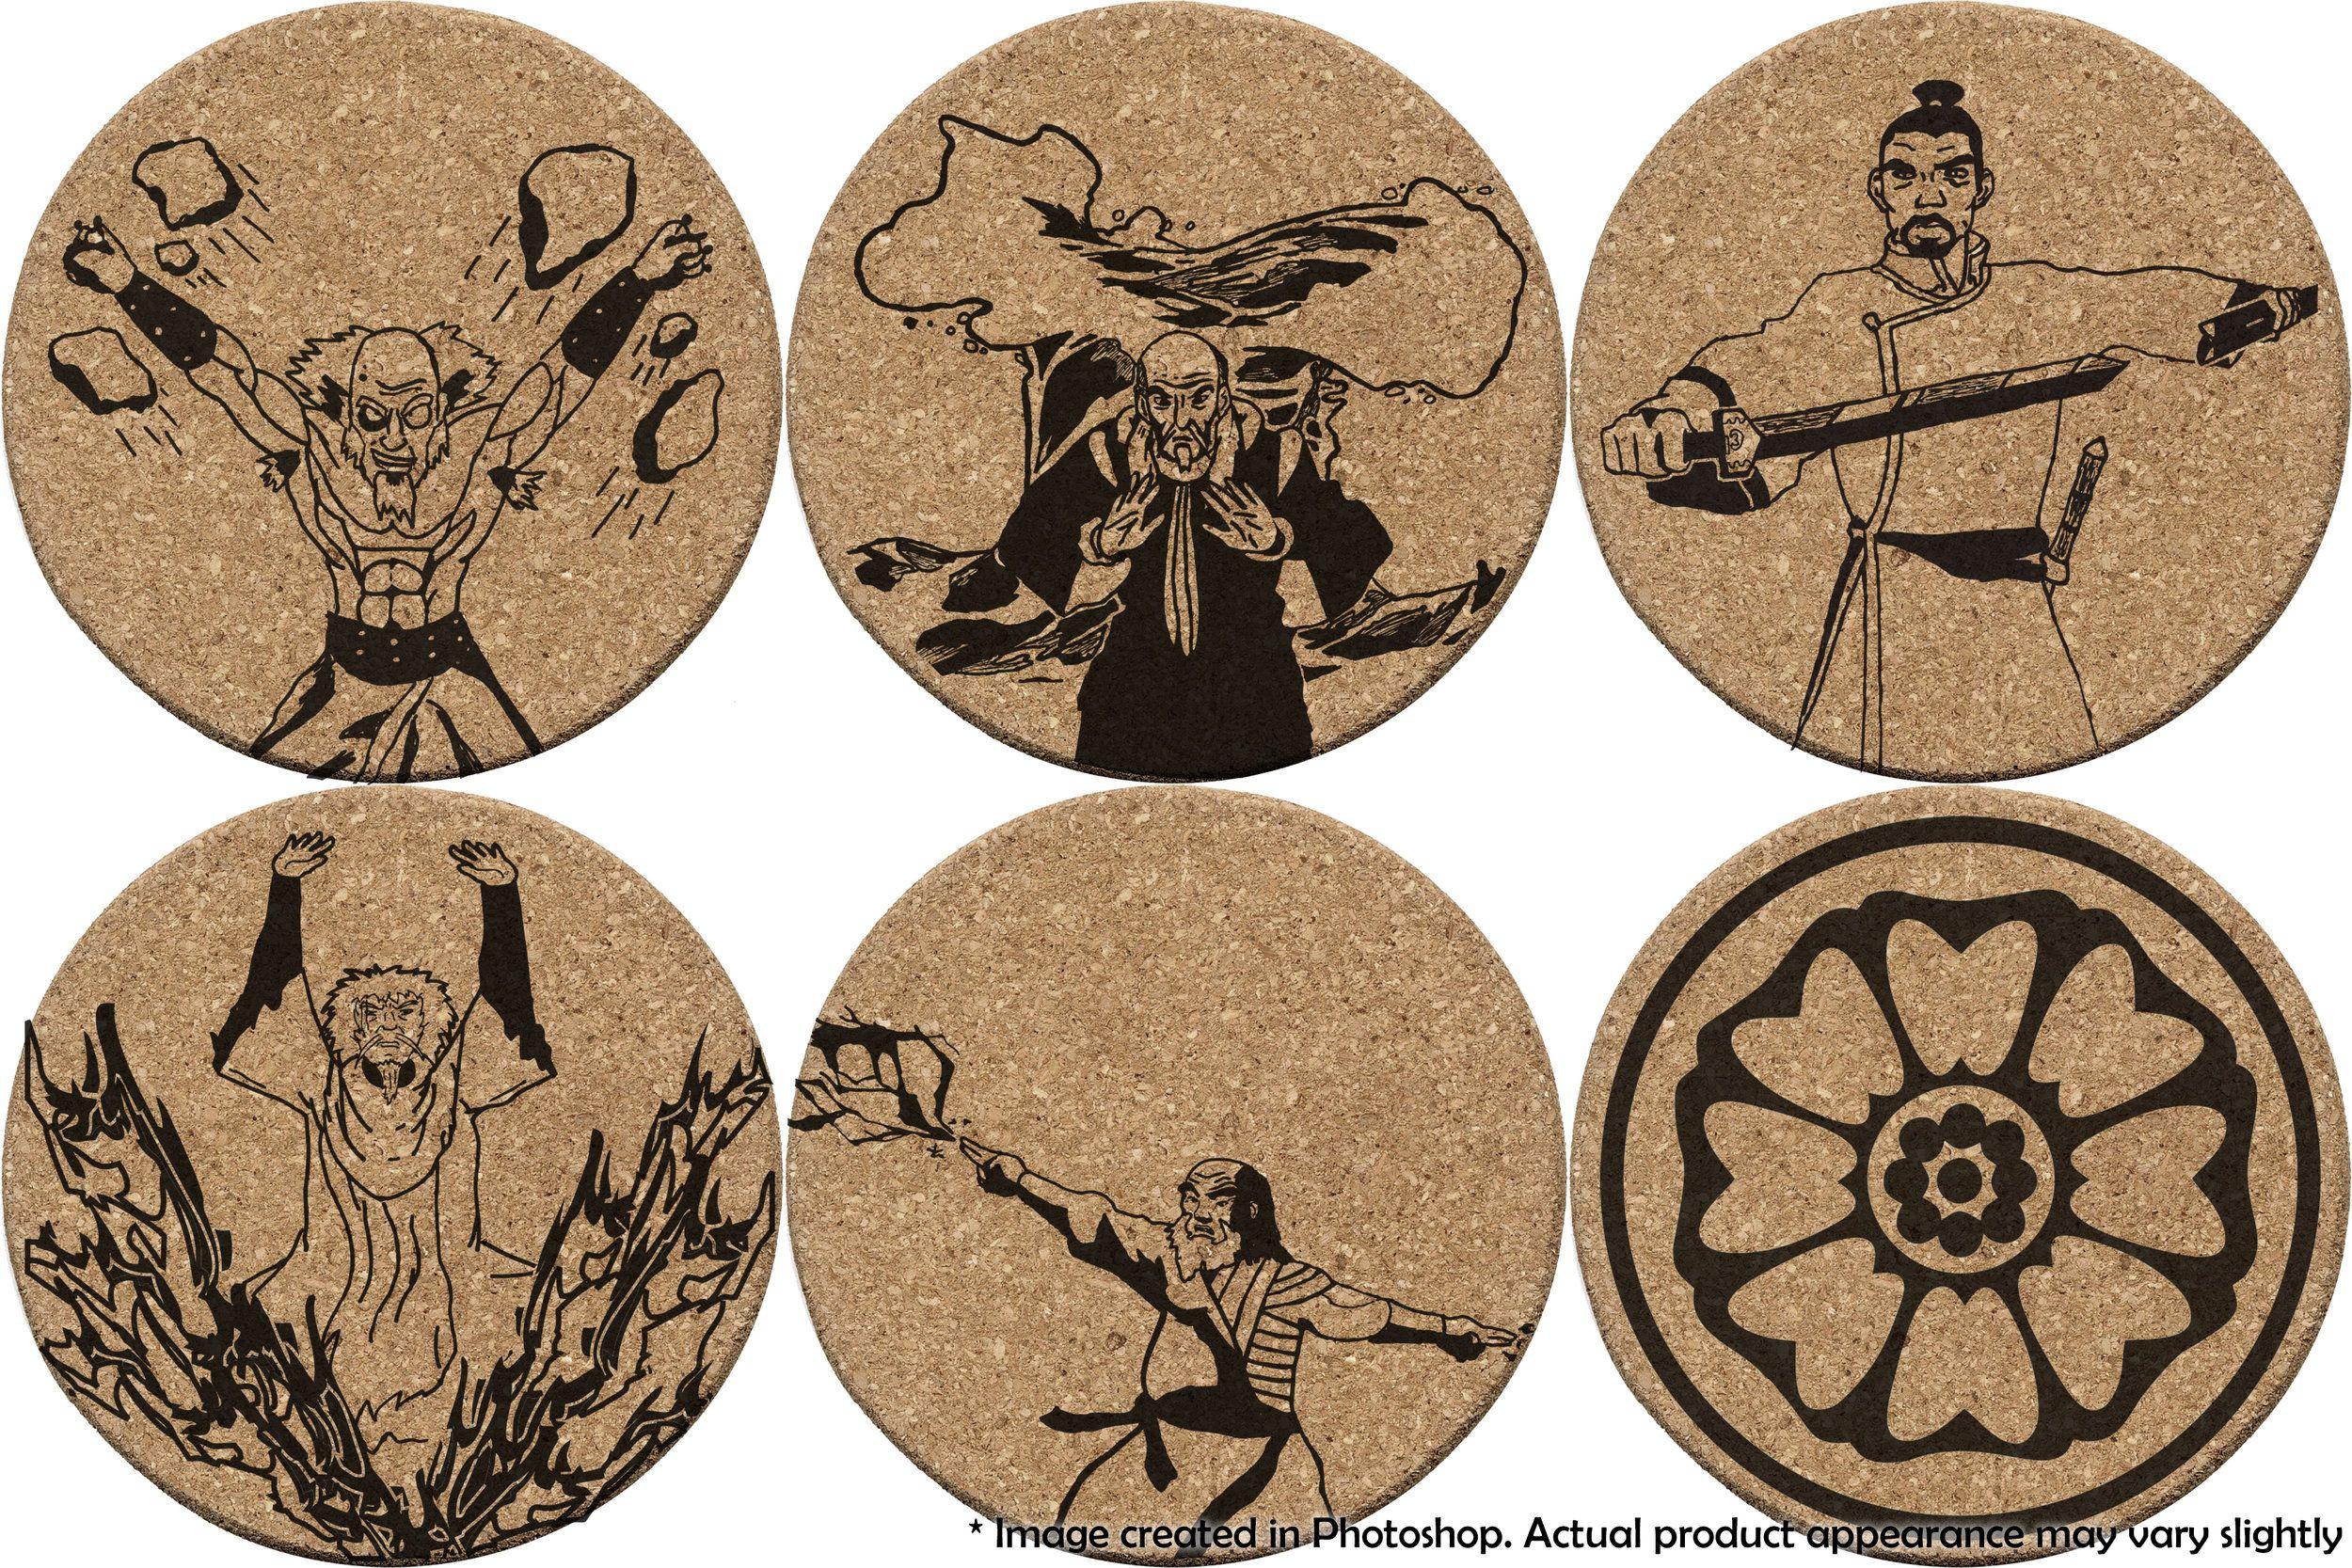 Avatar White Lotus Coaster Set With Images White Lotus Steel